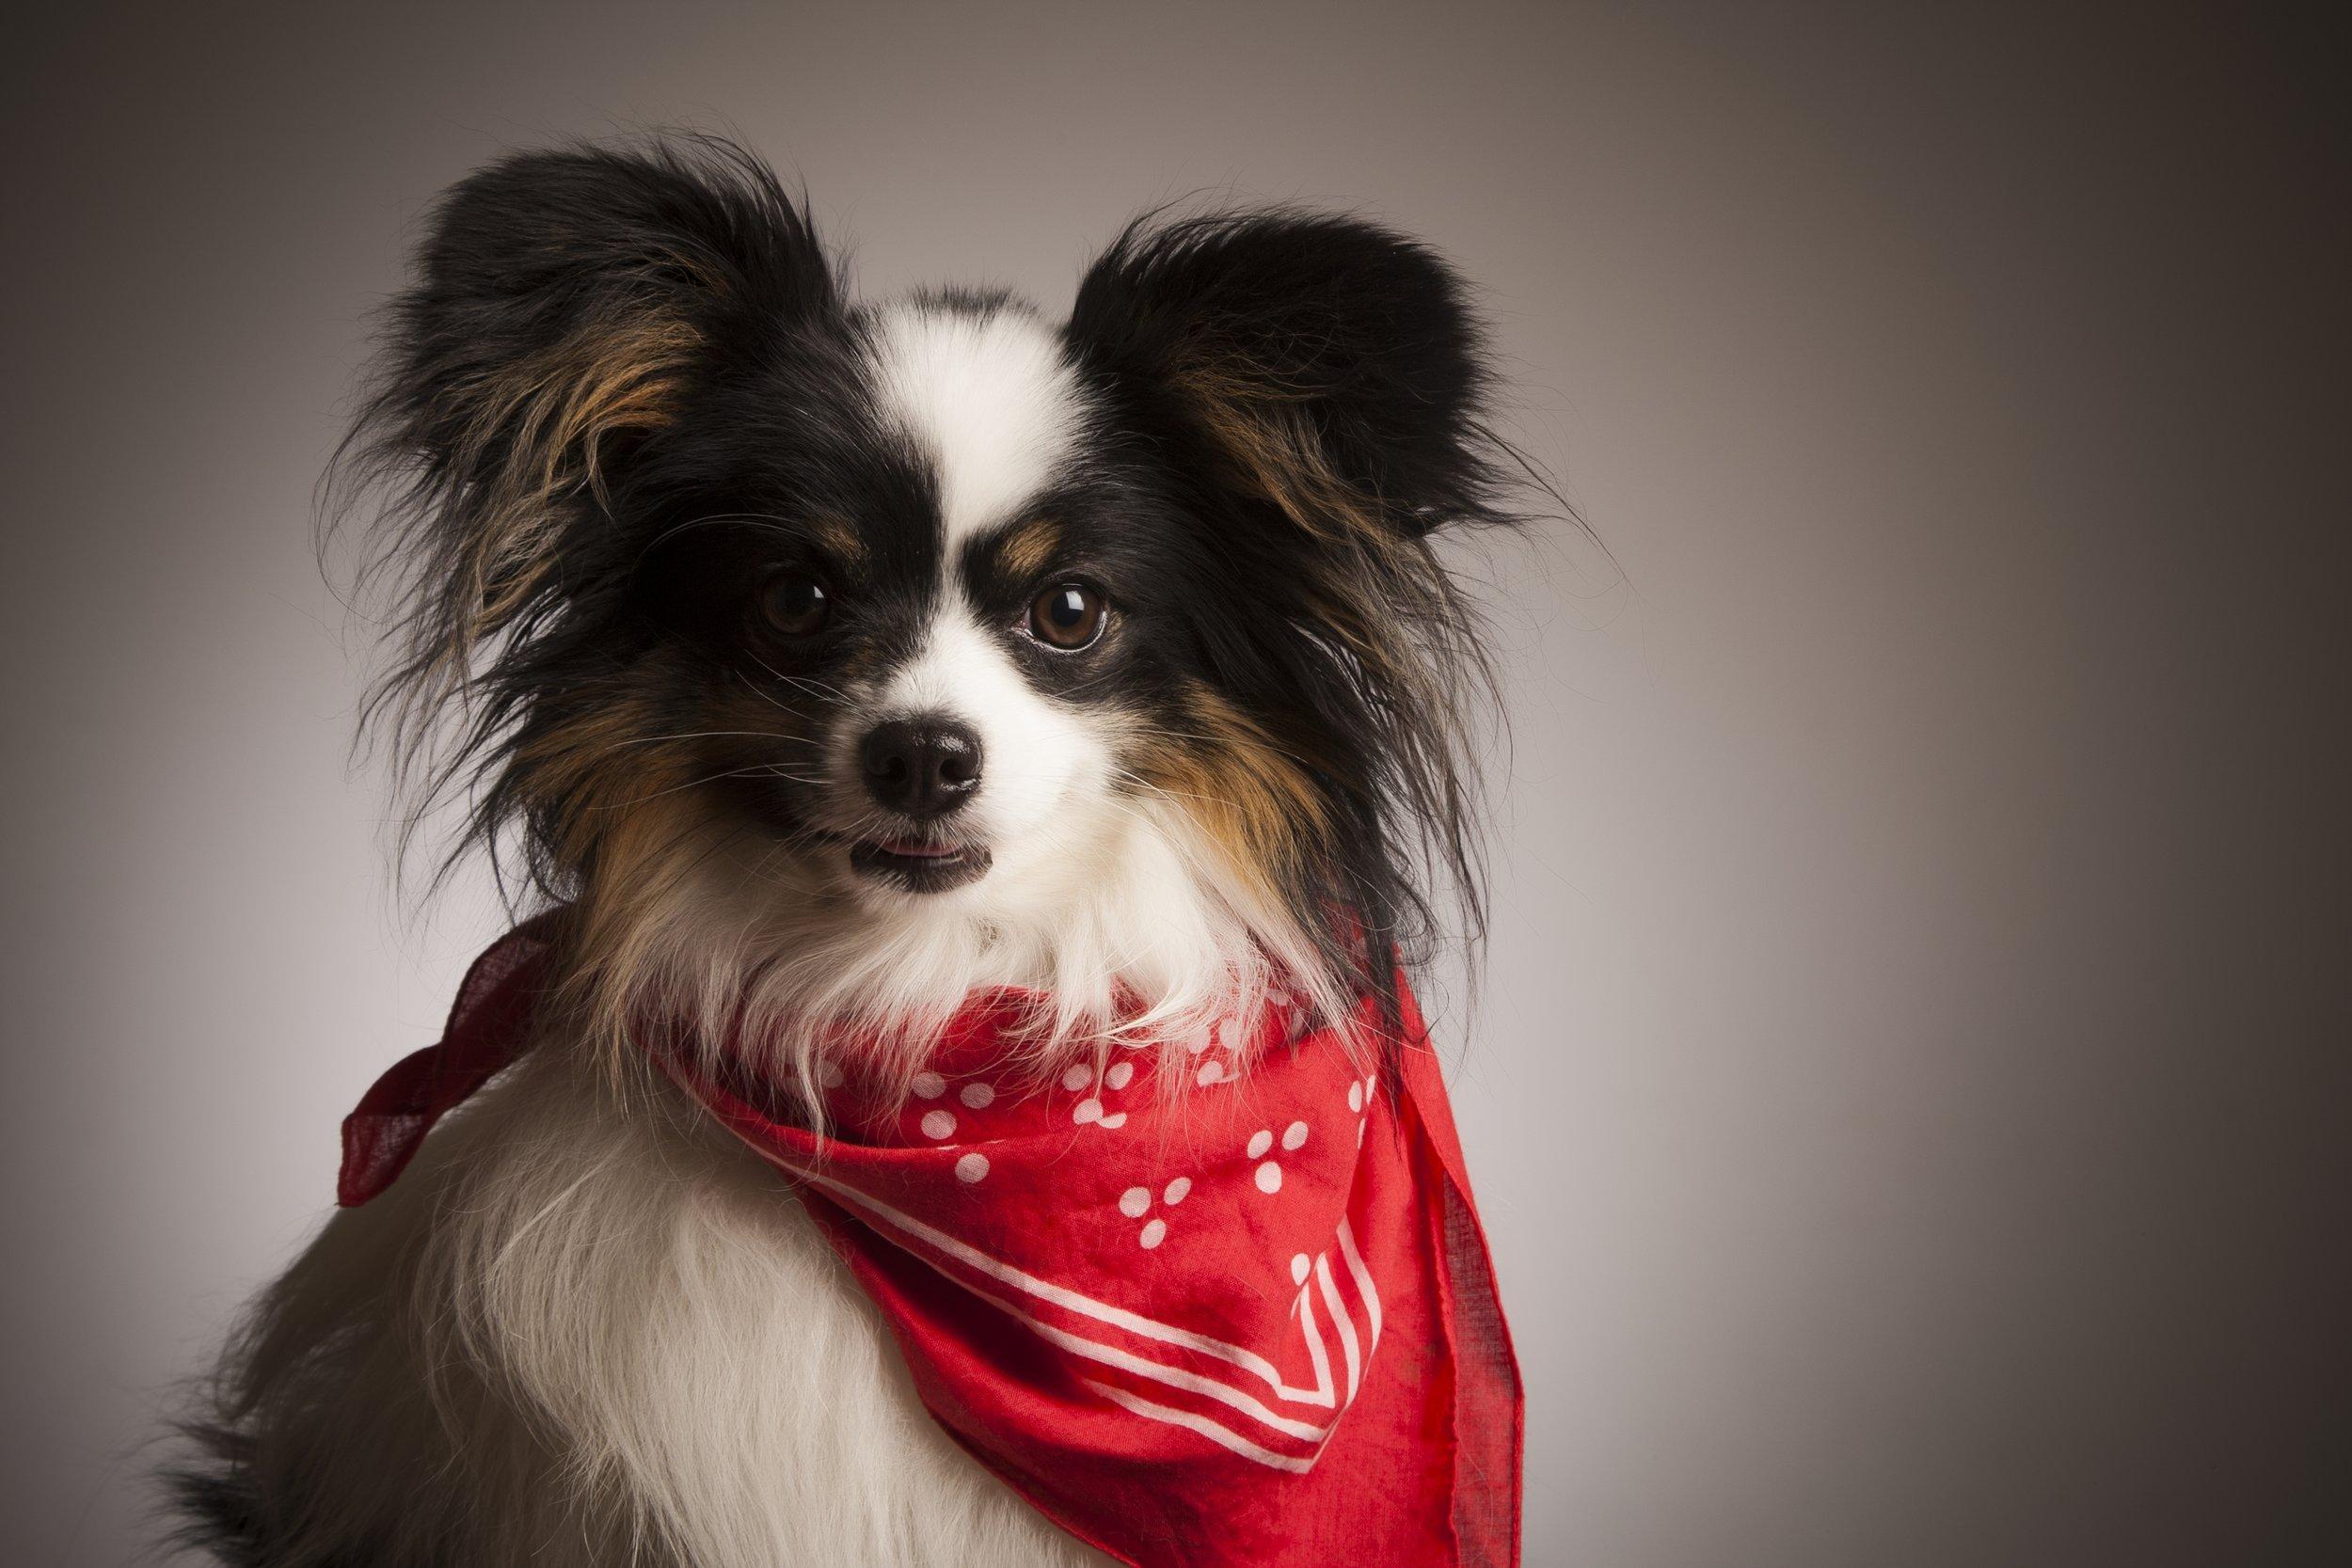 zigzag-photography-leicester-zig-zag-photographers-photo-studio-clarendon-park-queens-road-best-family-portraits-children-dog-bandana-red-animal.jpg